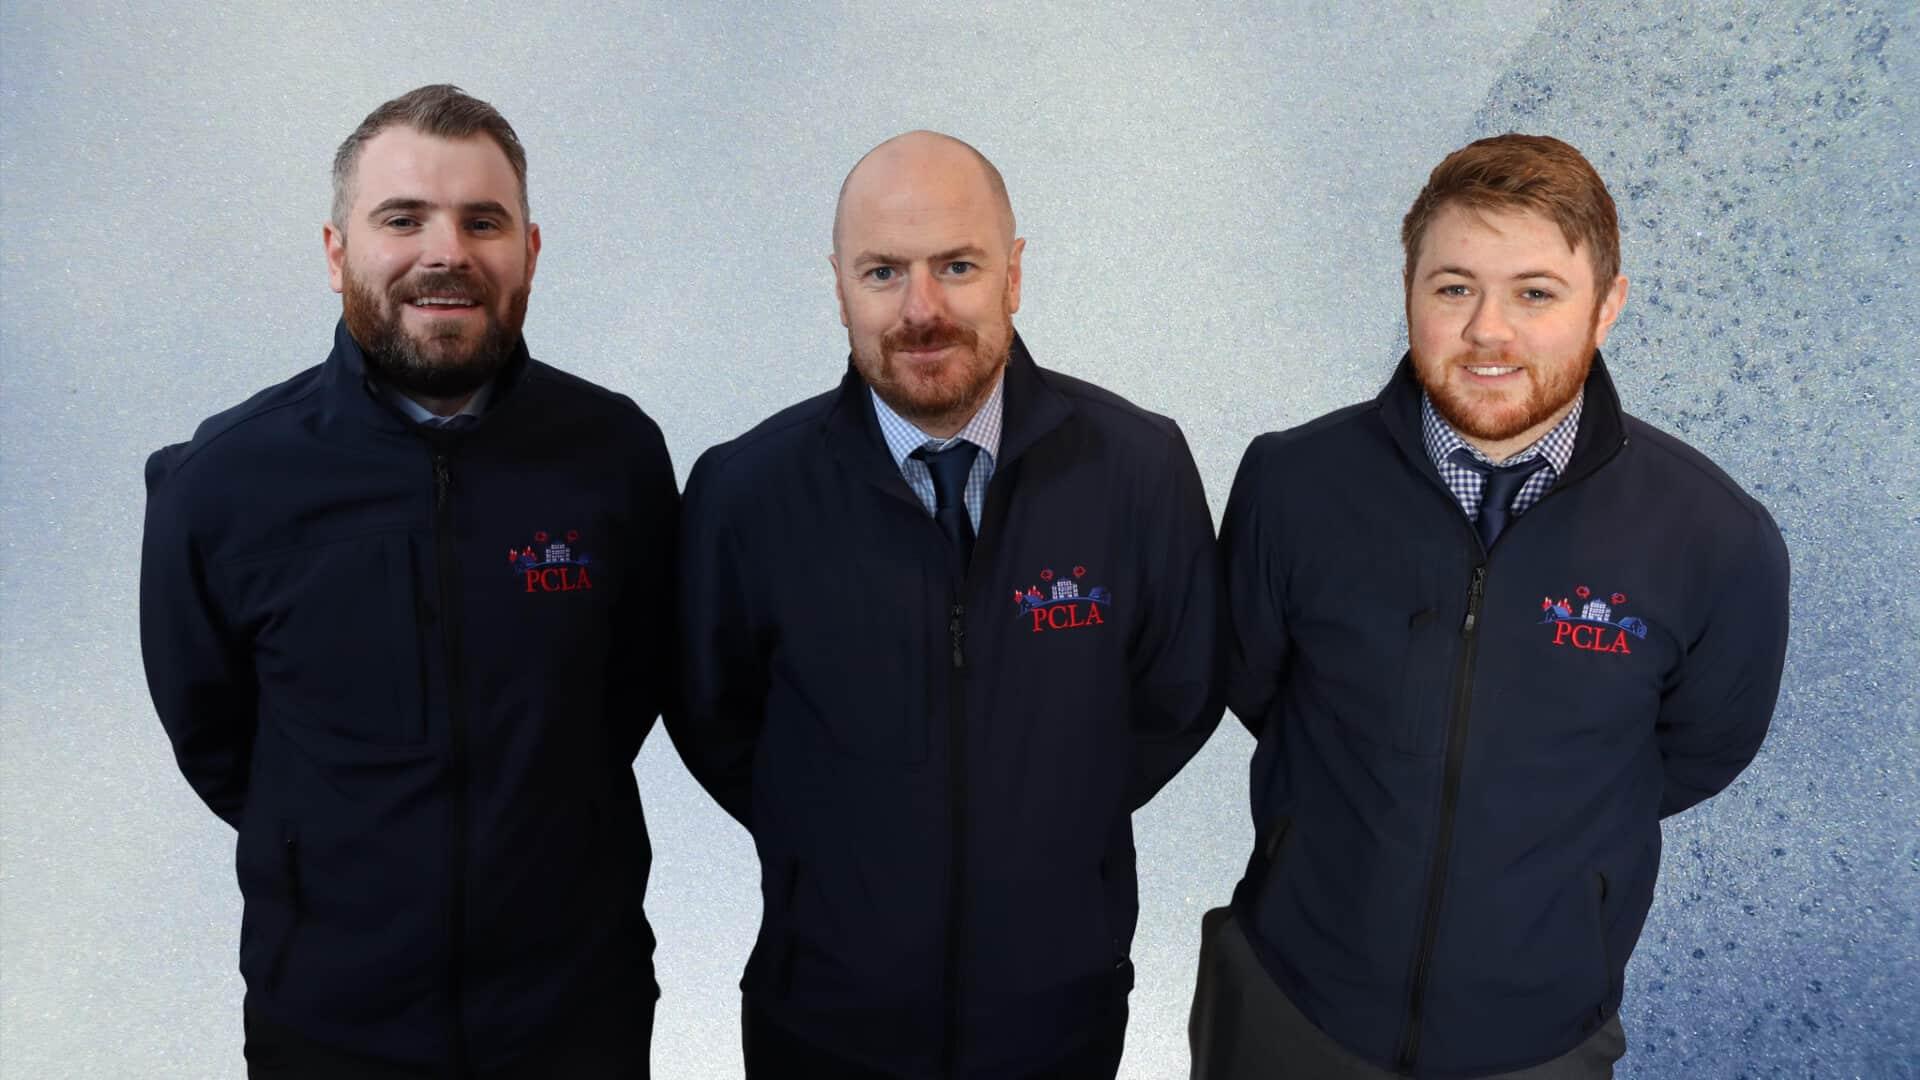 The PCLA Team